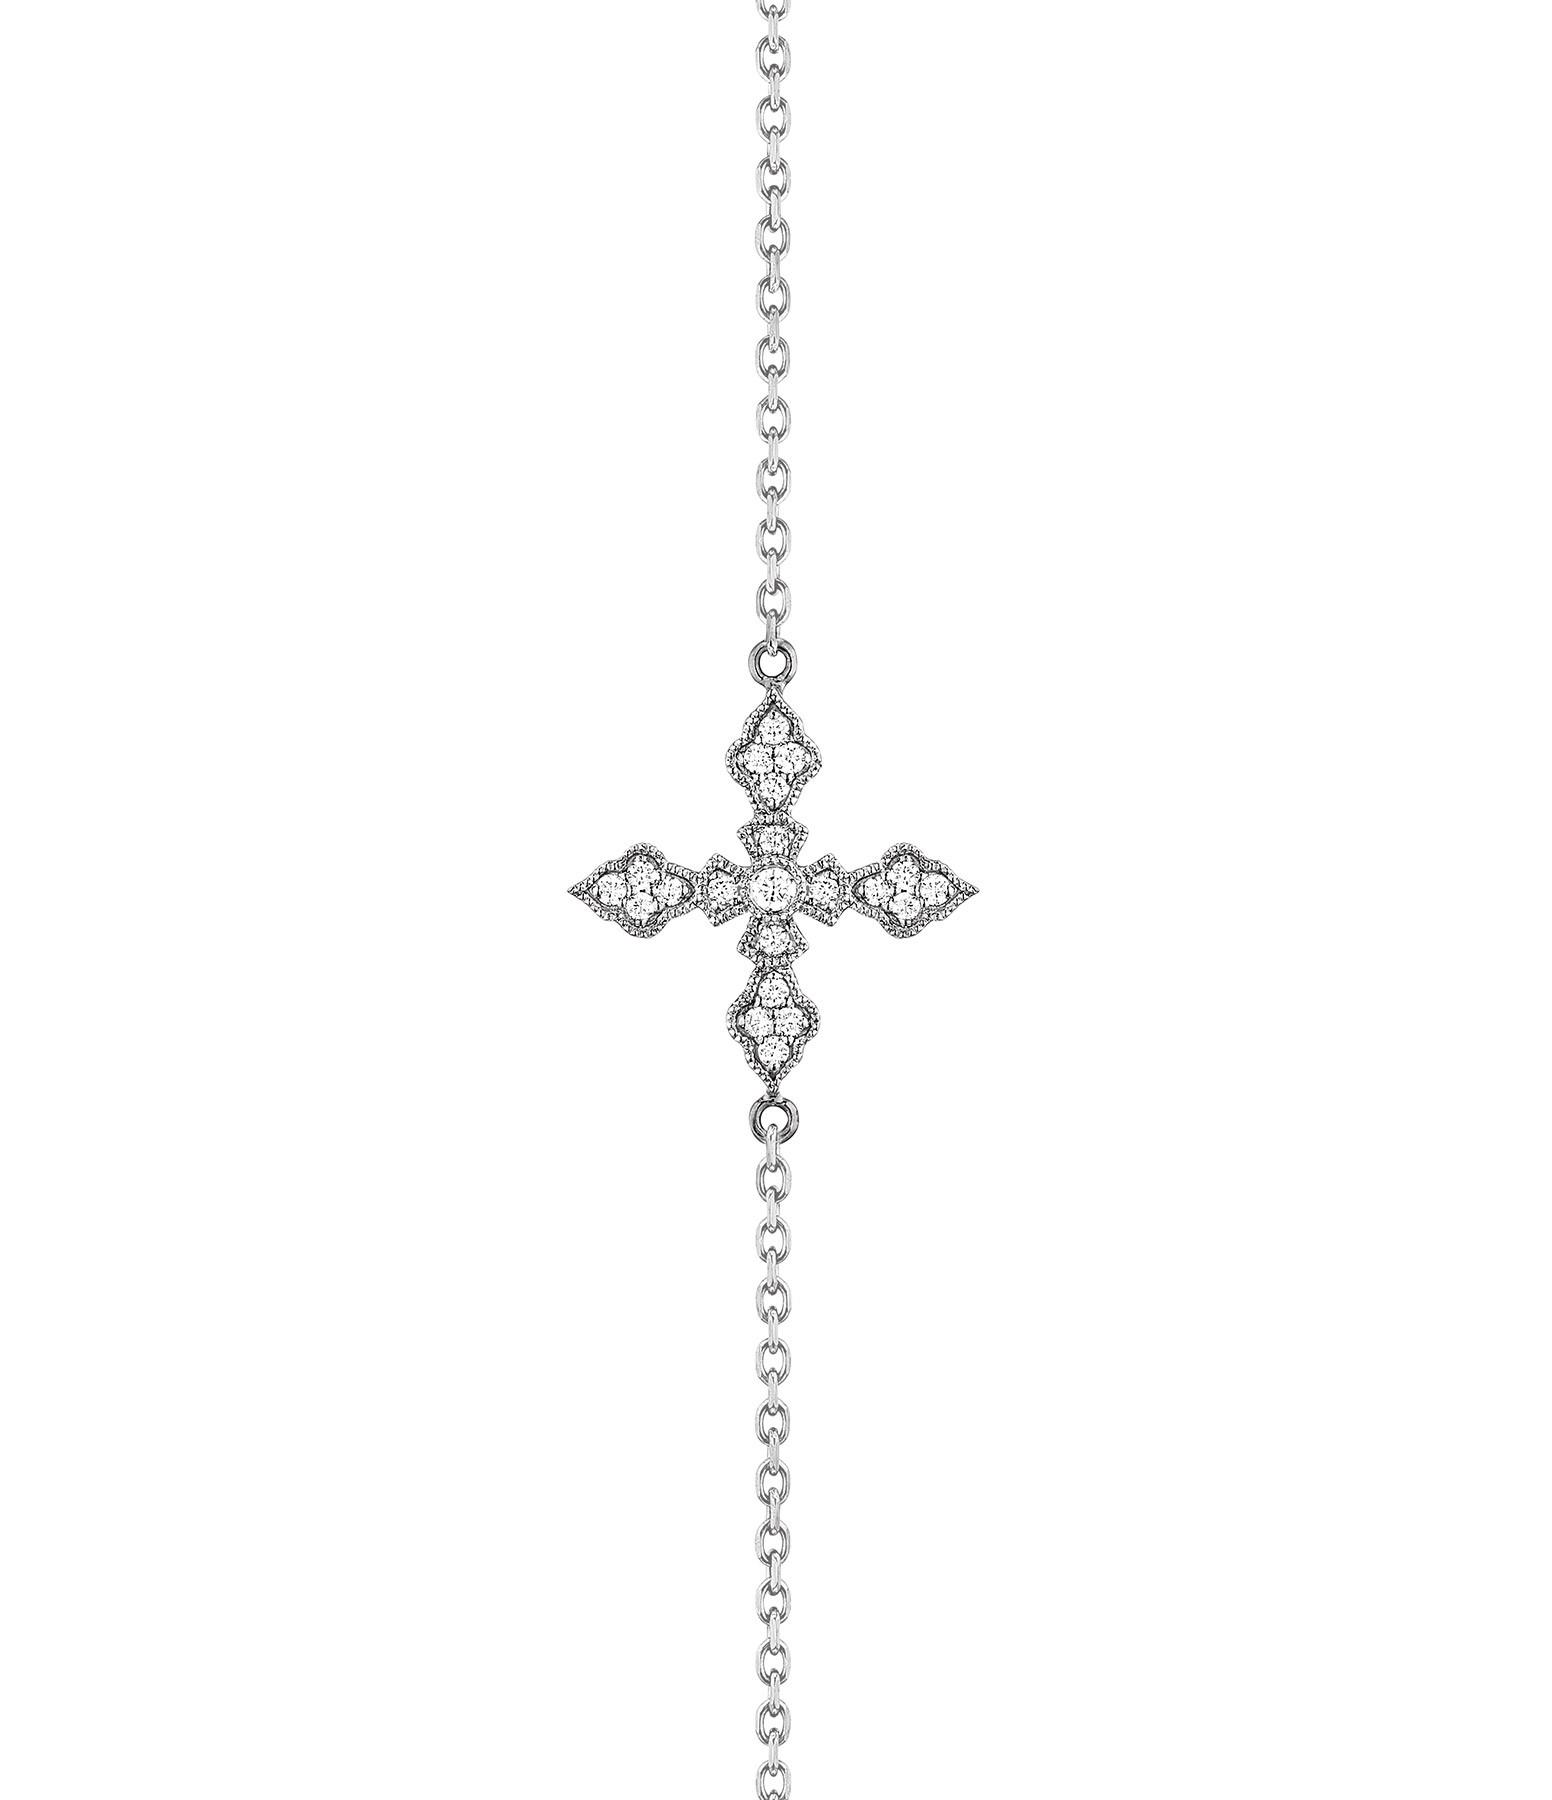 STONE PARIS - Bracelet Virgin Or Diamants